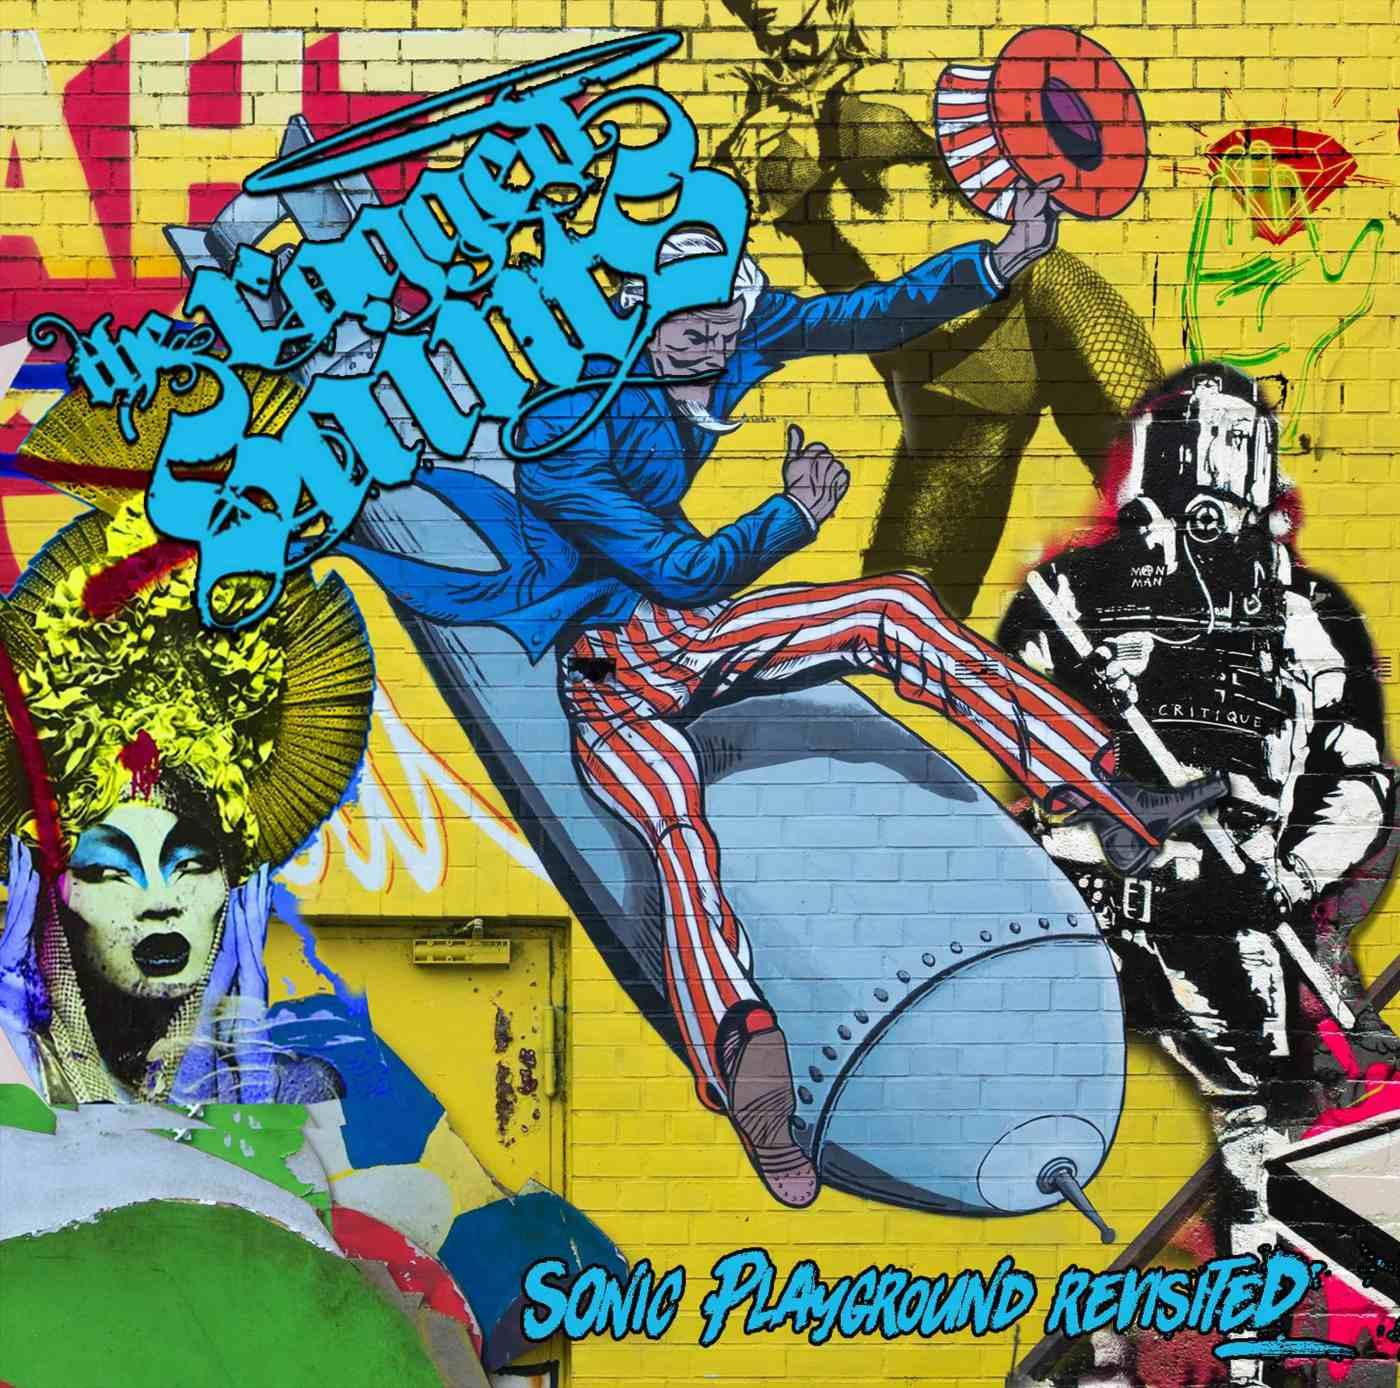 ¿Qué estáis escuchando ahora? The-ragged-saints-sonic-playground-revisited